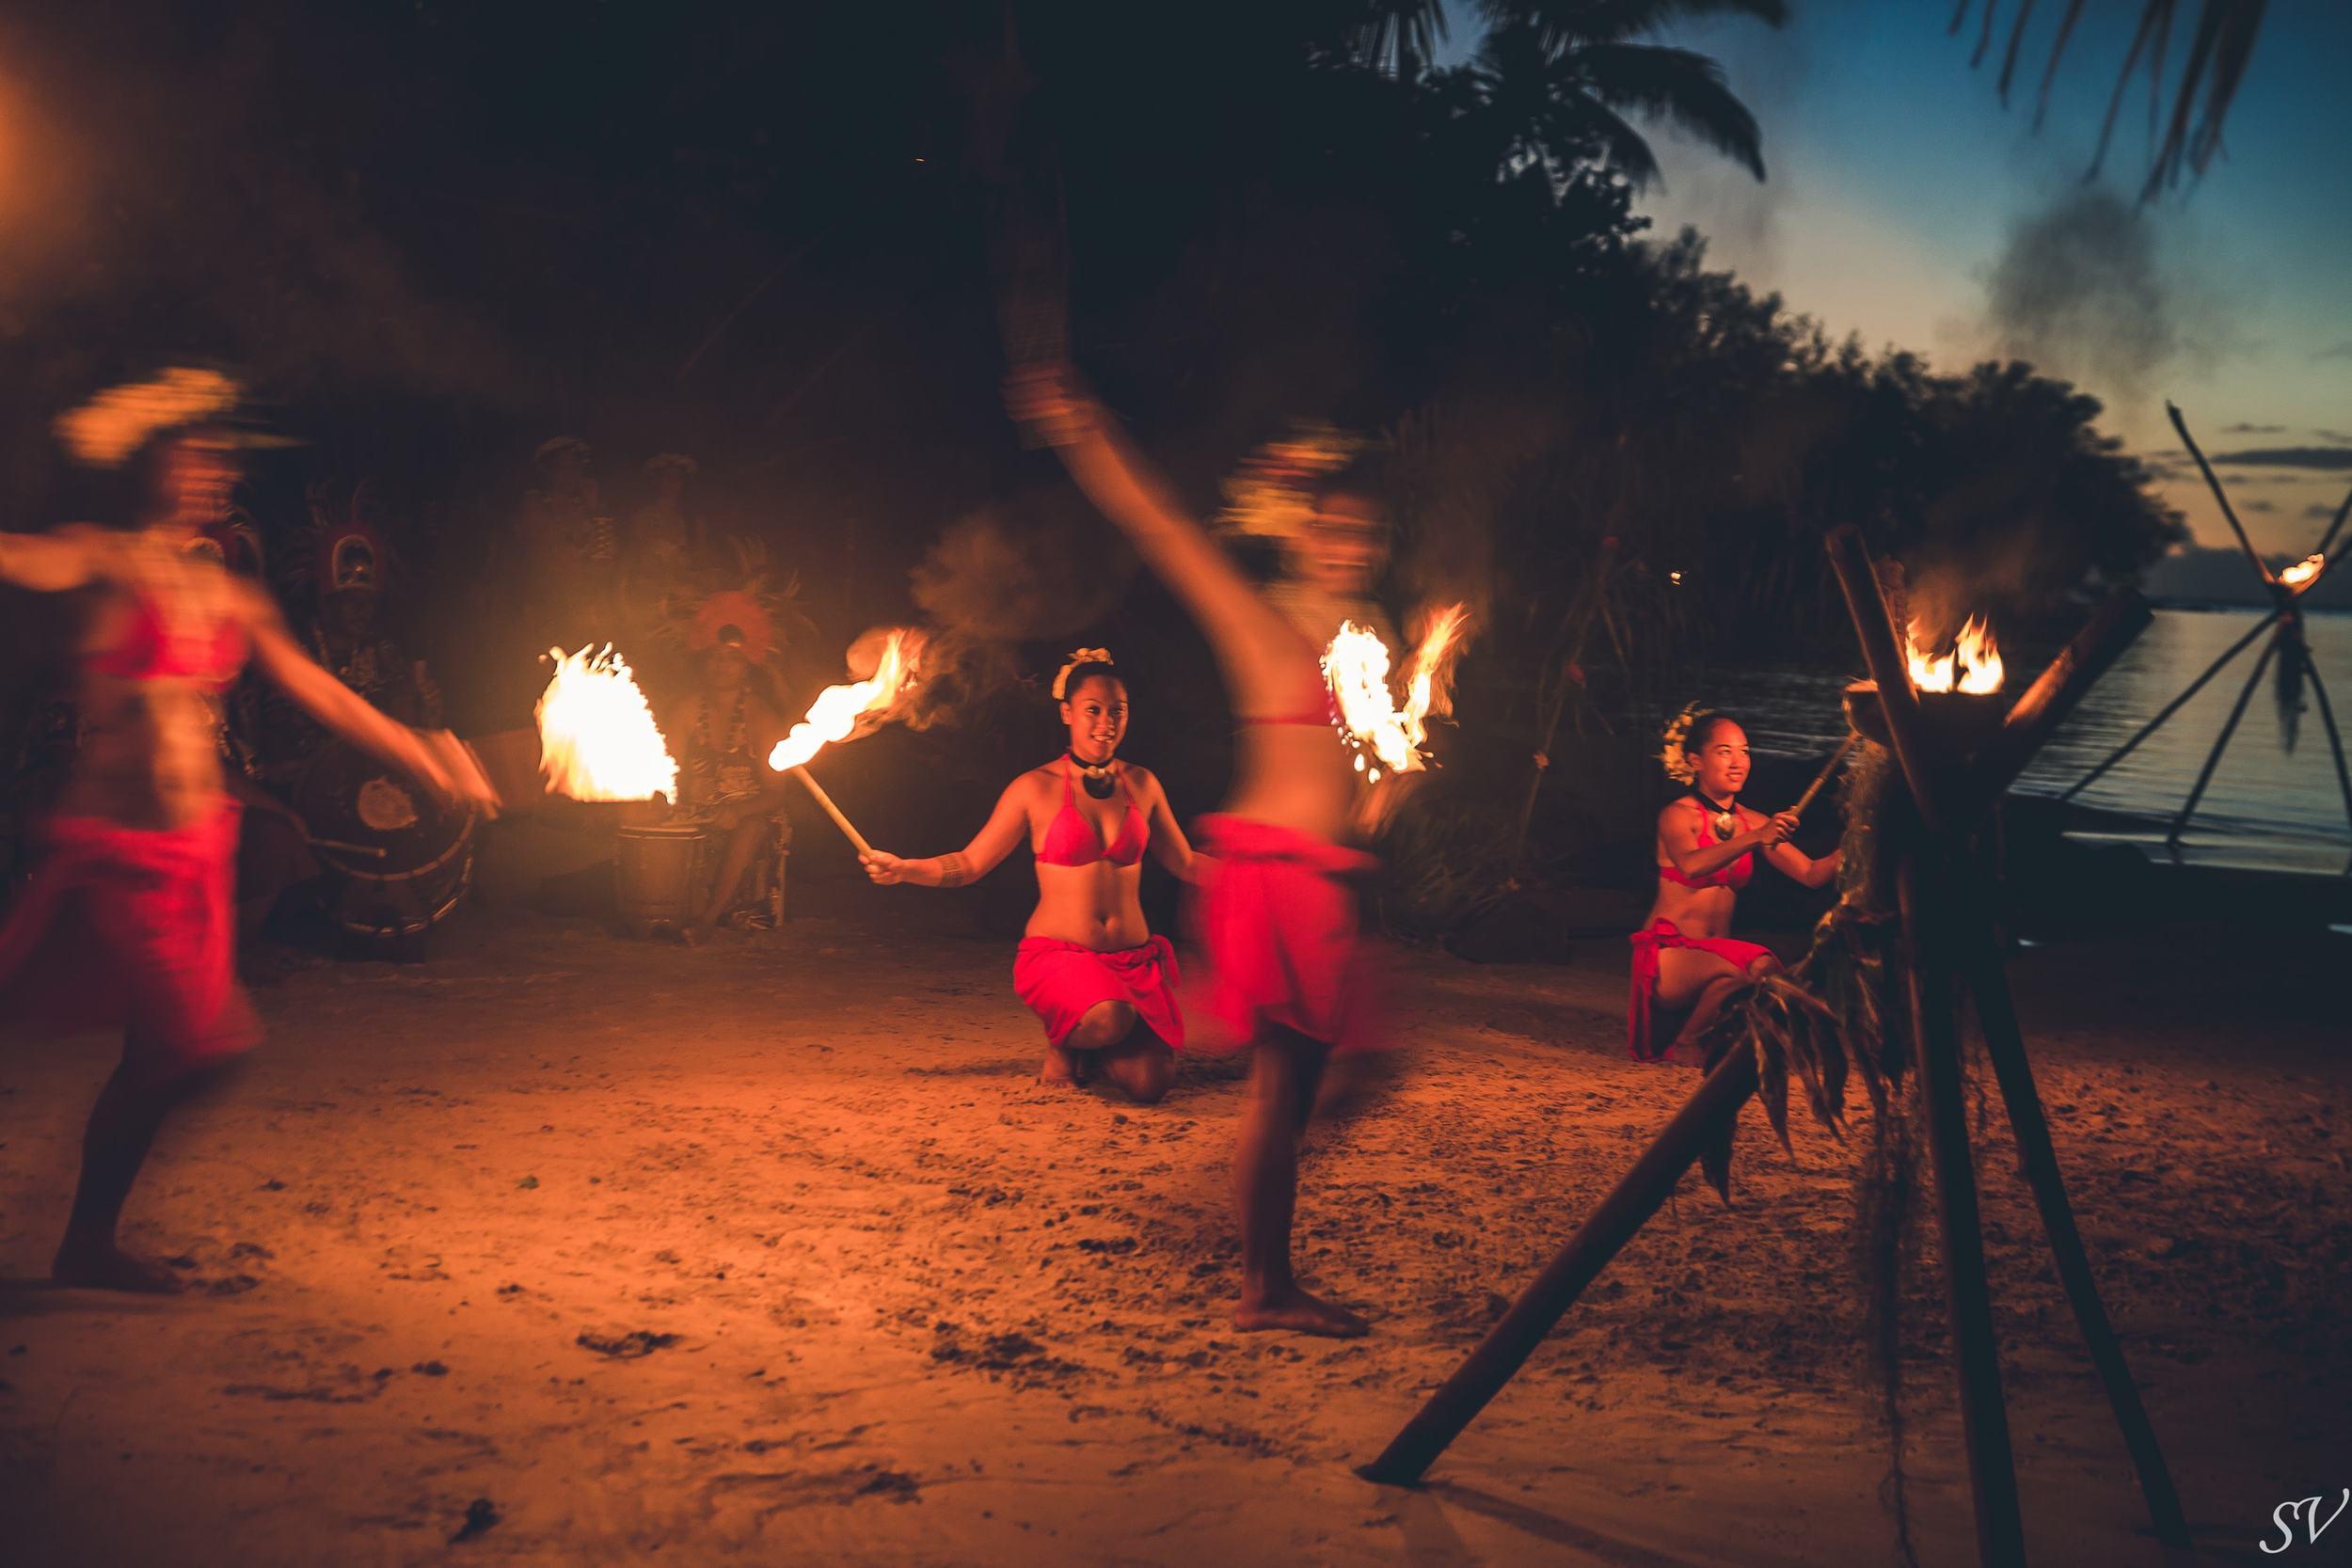 Fire dancer during a wedding on the beach